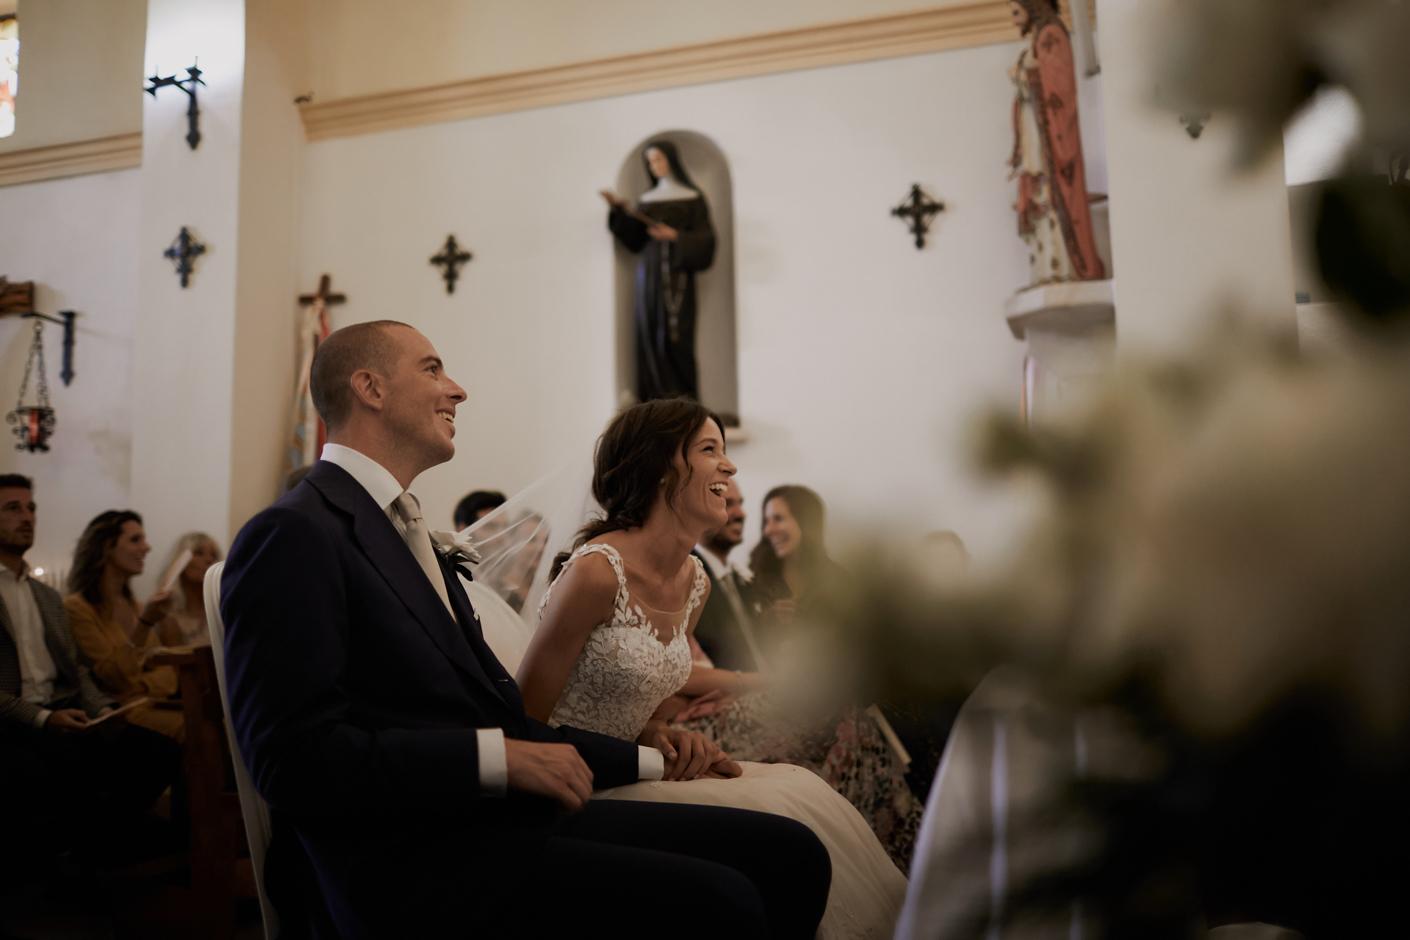 reportage durante la cerimonia religiosa a San Pantaleo